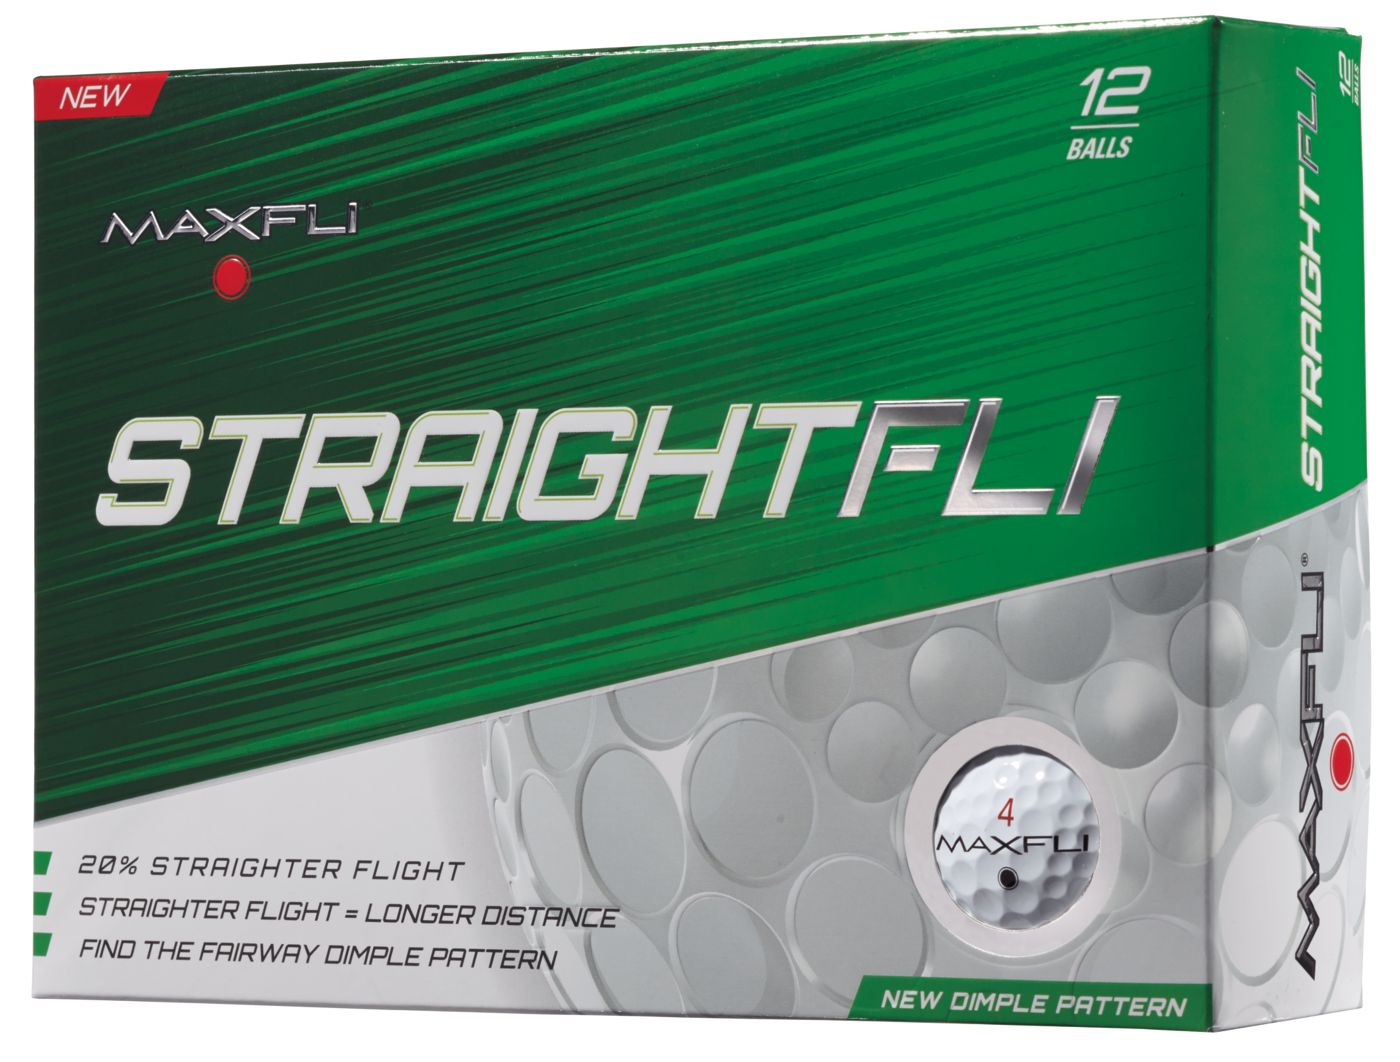 Maxfli StraightFli Golf Balls - 12 Pack